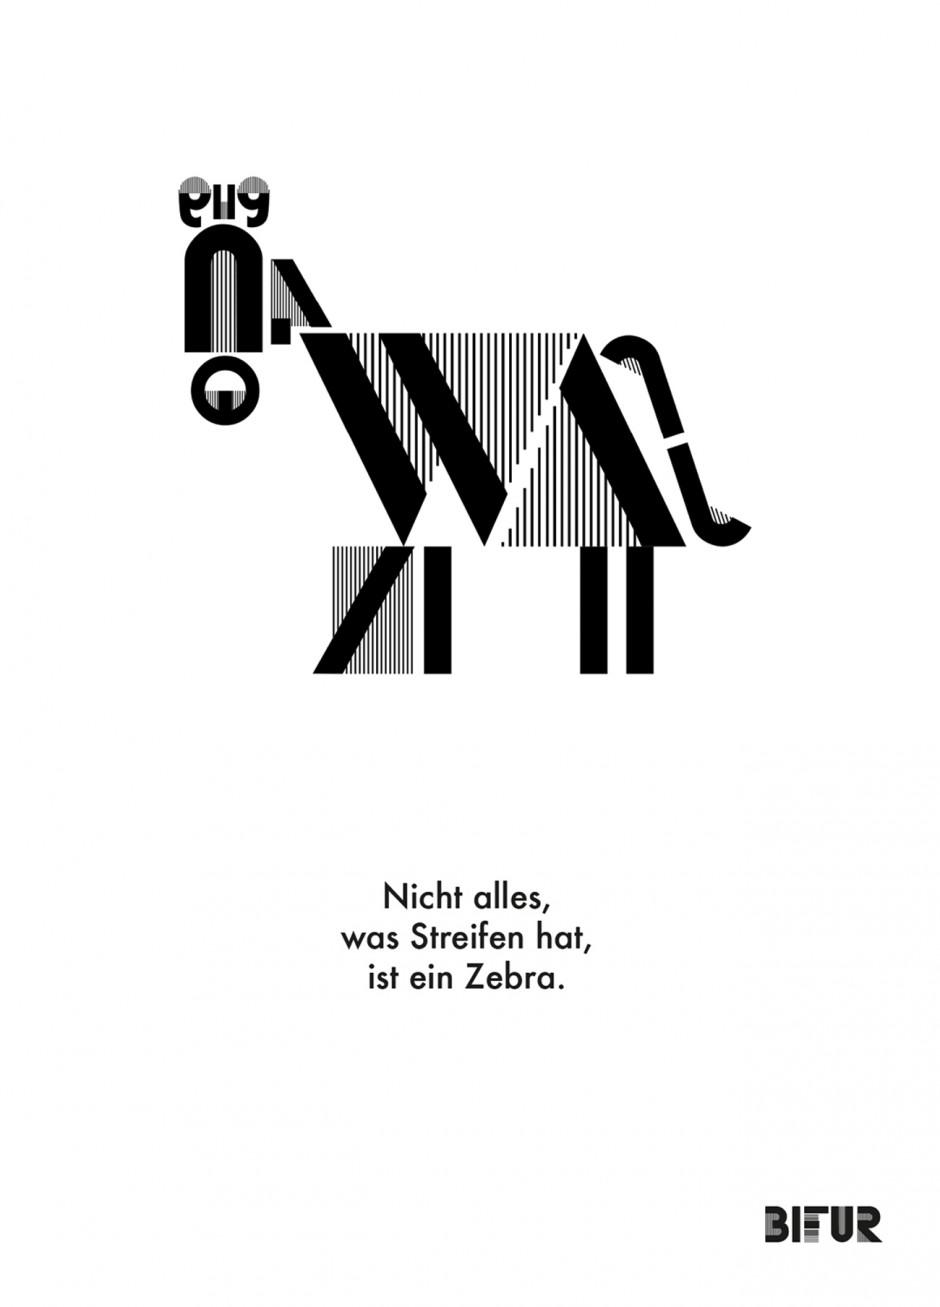 Bifur Plakatserie